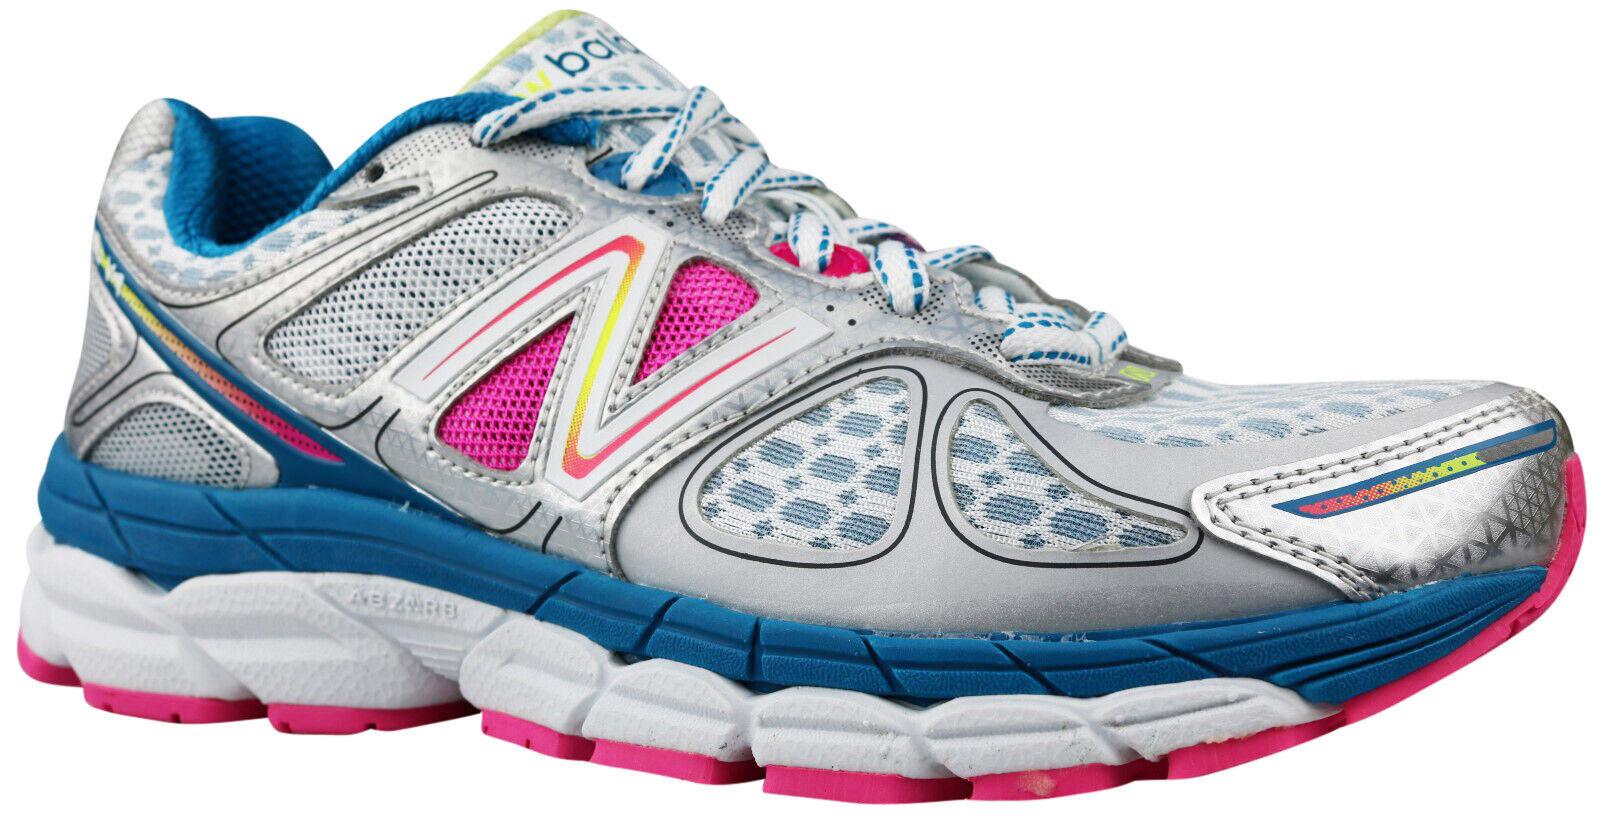 New balance w860 B v4 señora zapatillas running zapatos de plata nuevo